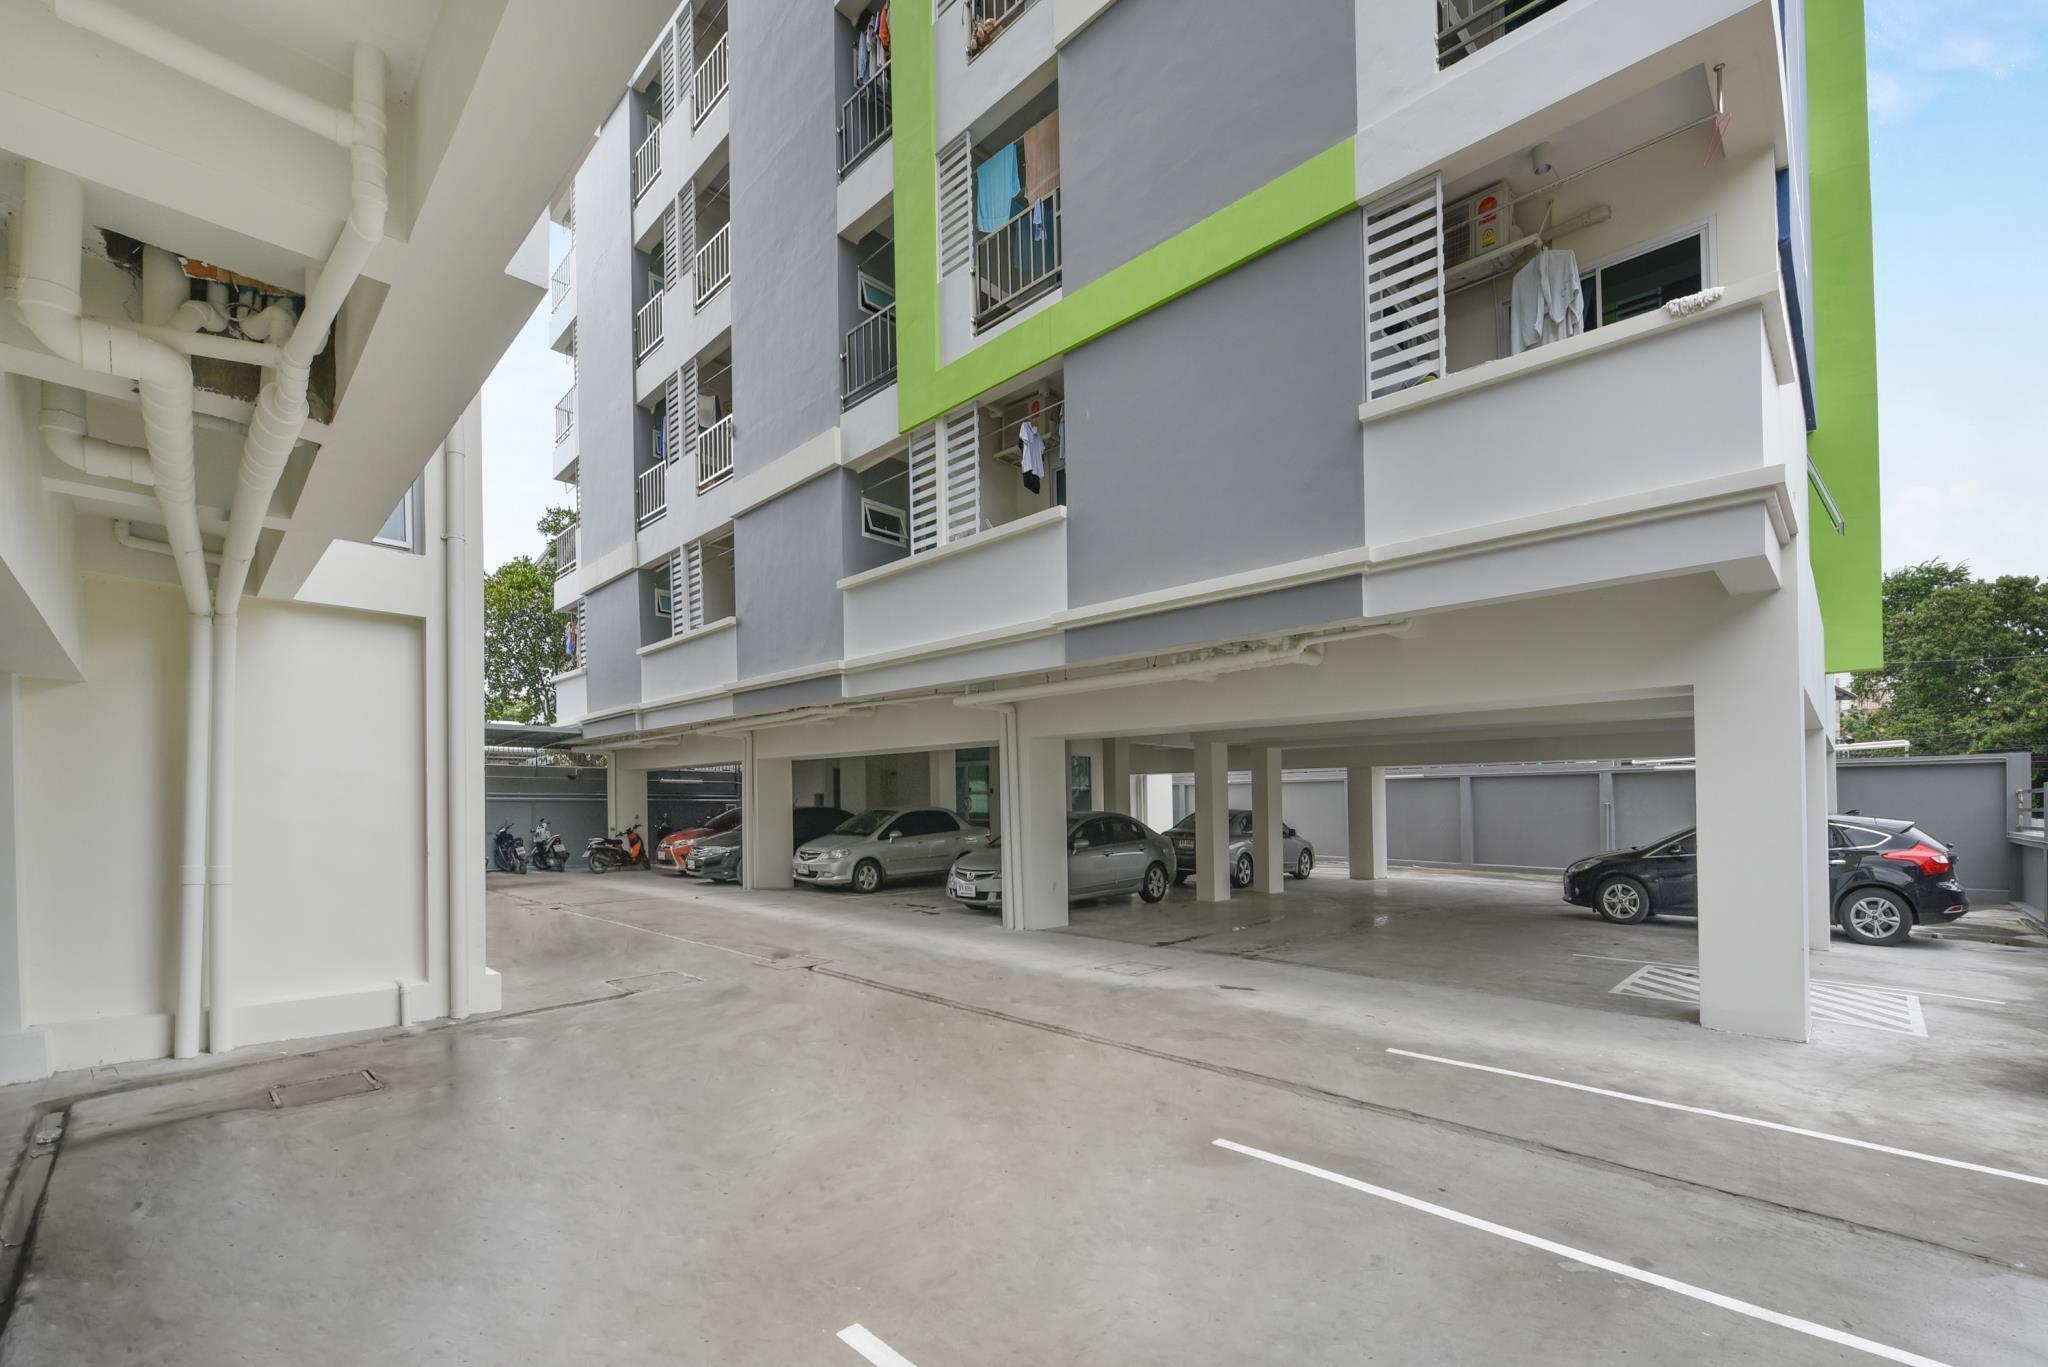 B32公寓,บี 32 อพาร์ตเมนต์